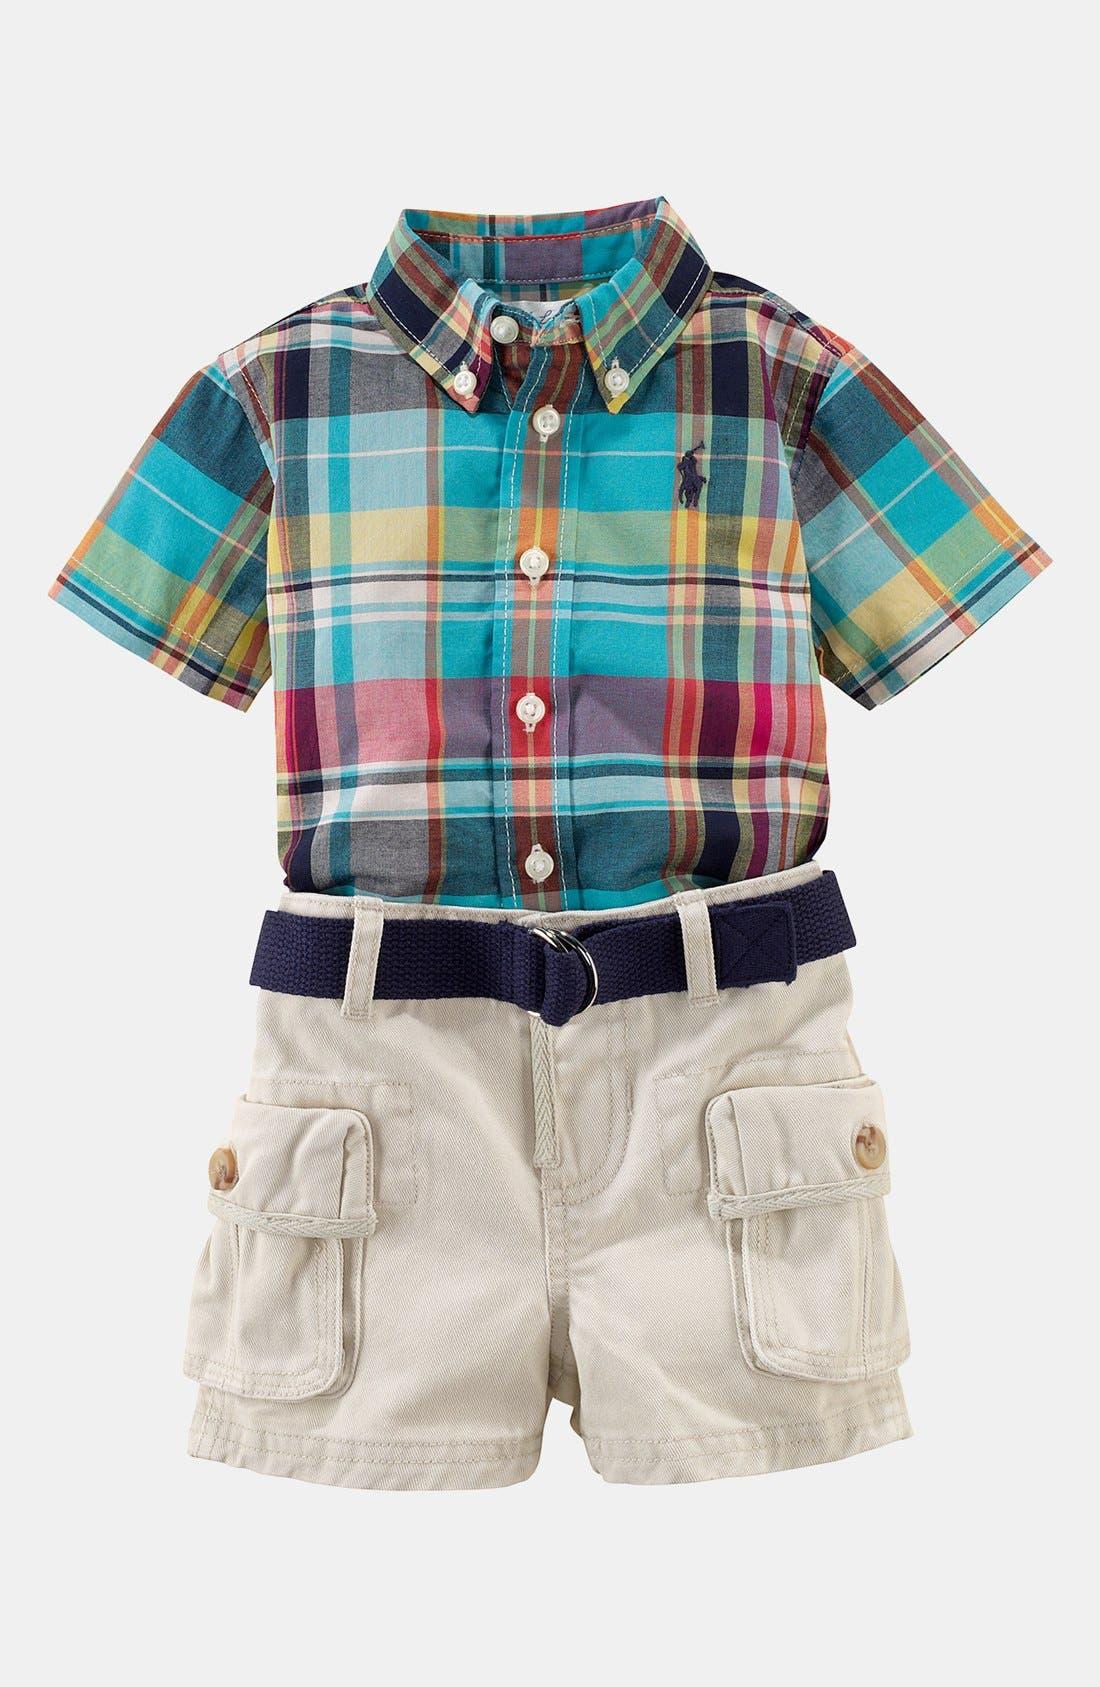 Main Image - Ralph Lauren Plaid Shirt & Shorts (Baby)